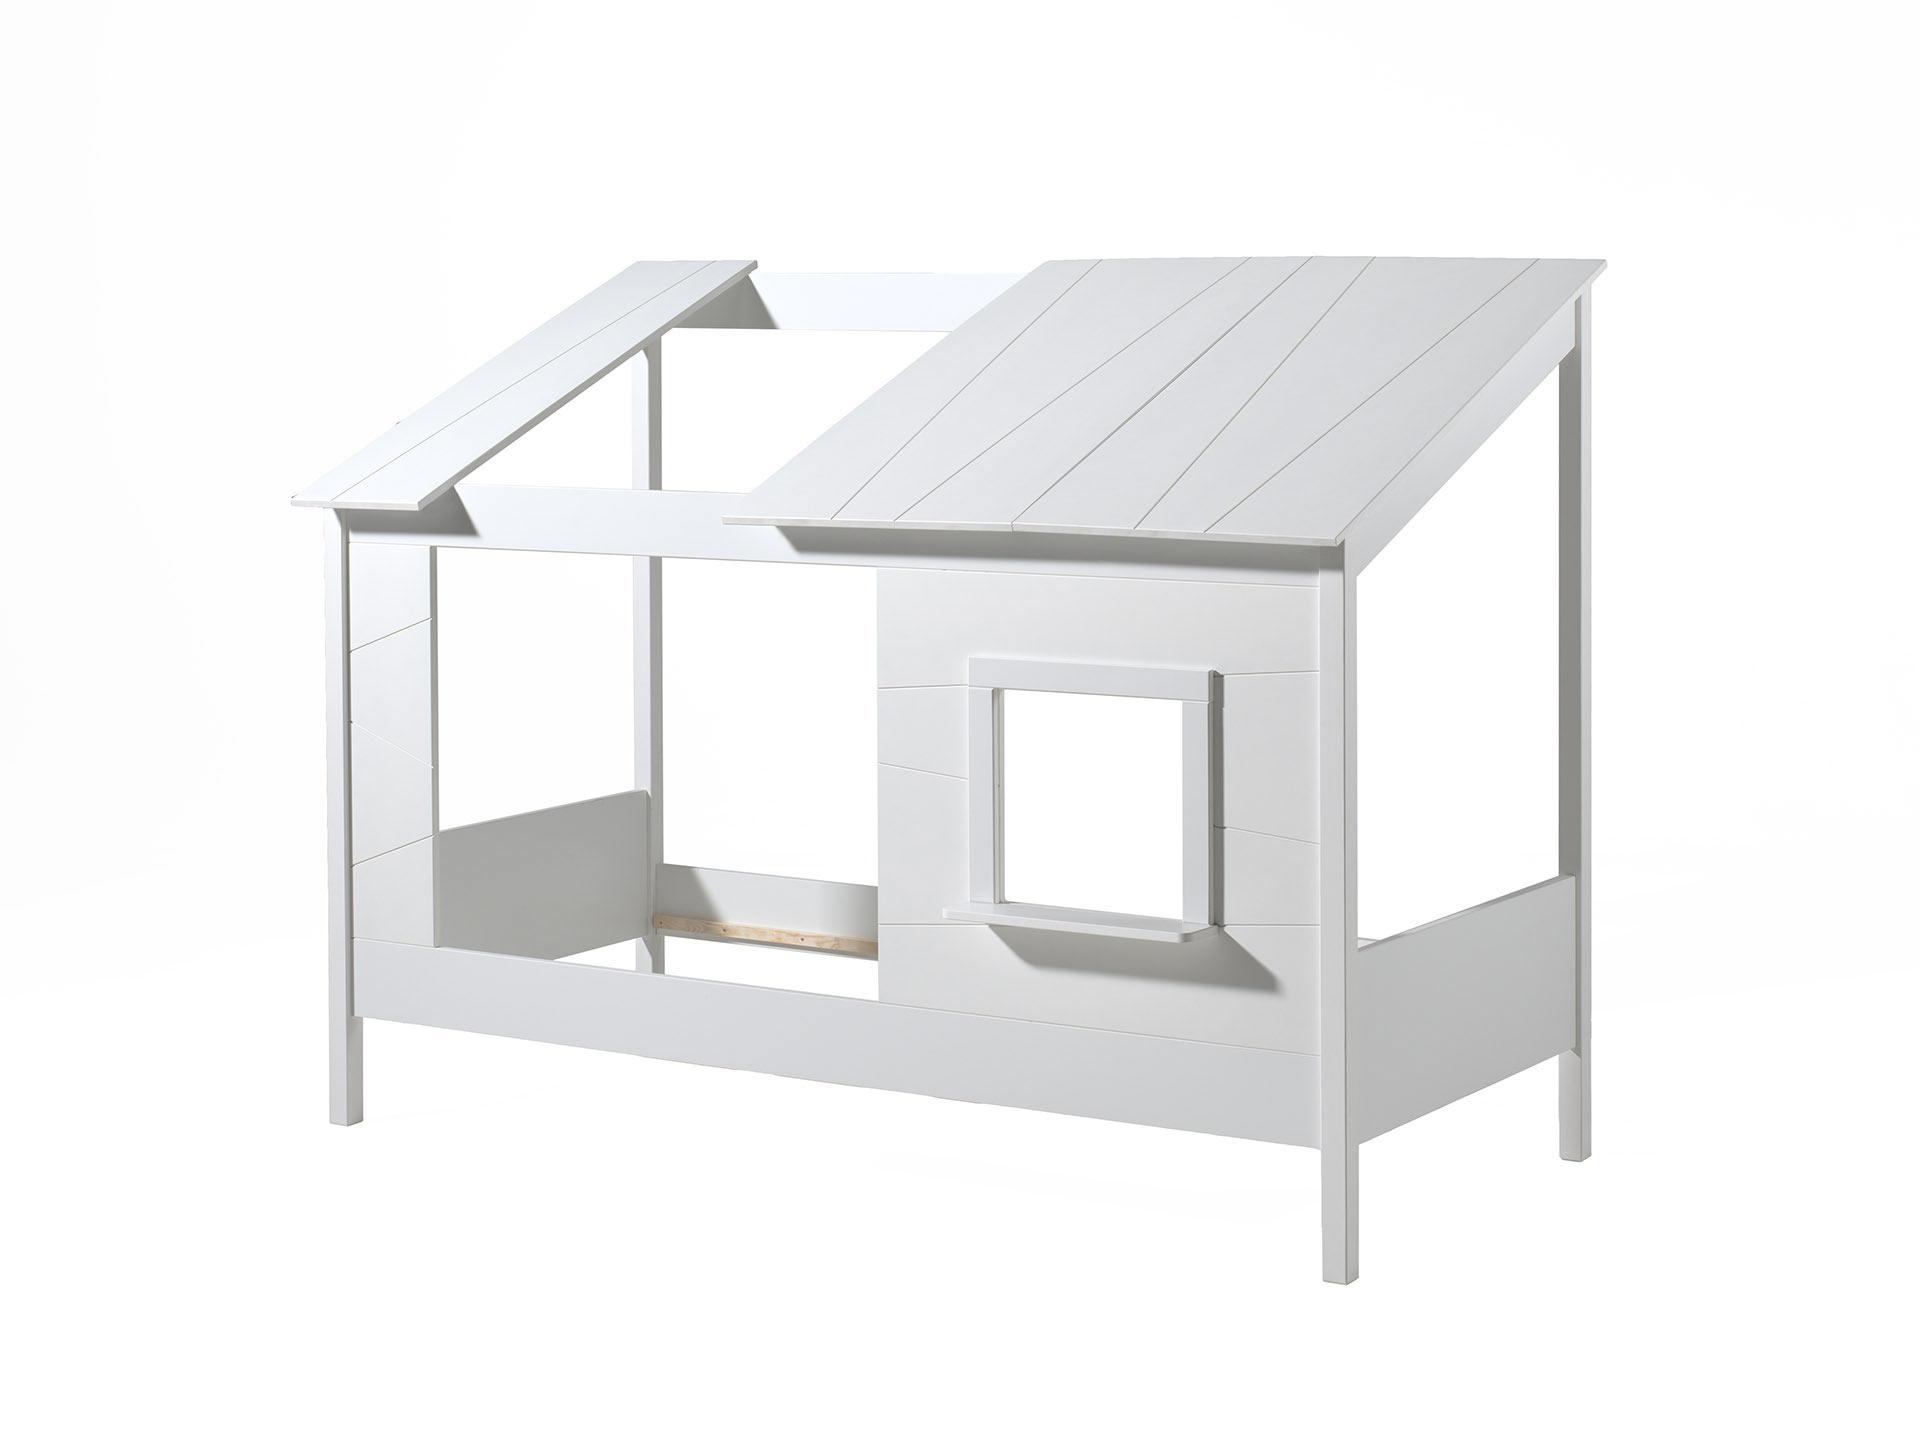 Lit cabane enfant moderne pin massif laqué blanc Madison II